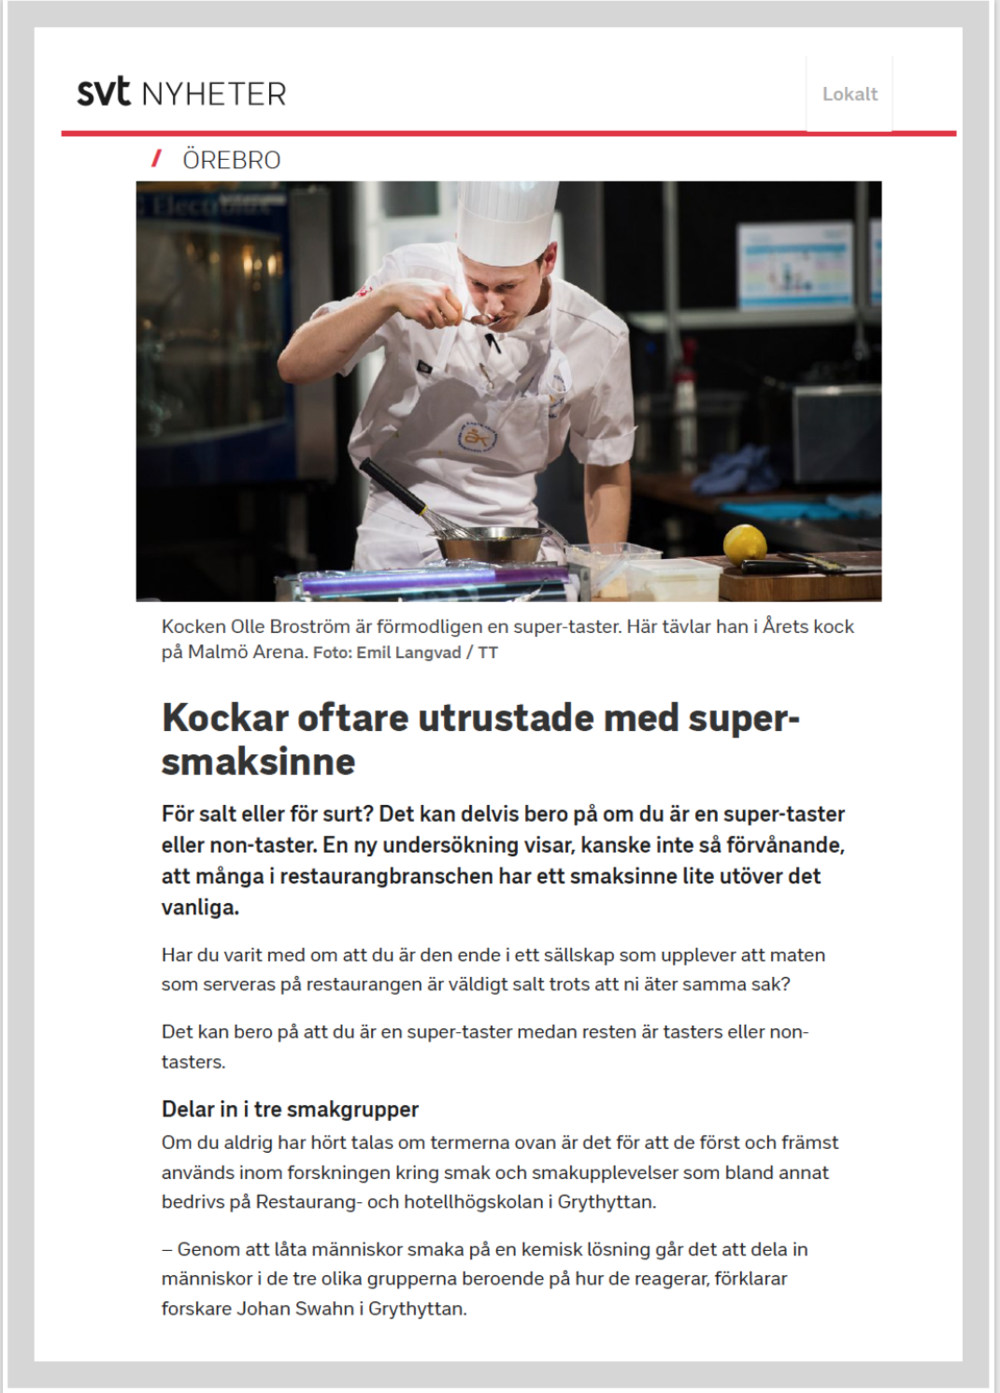 SVT.SE, Juni 13 2018